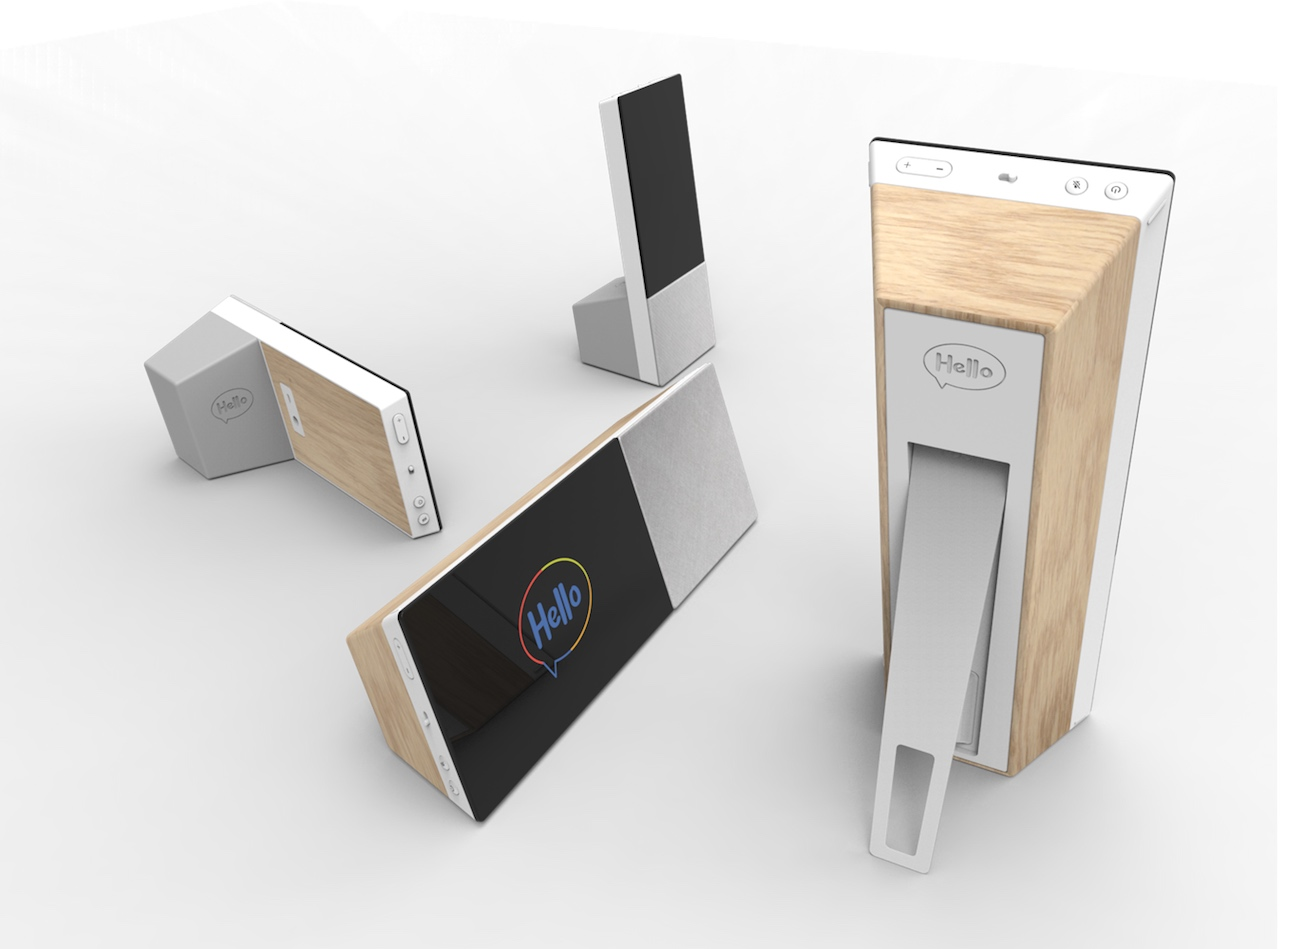 ARCHOS Hello Google Assistant Smart Display